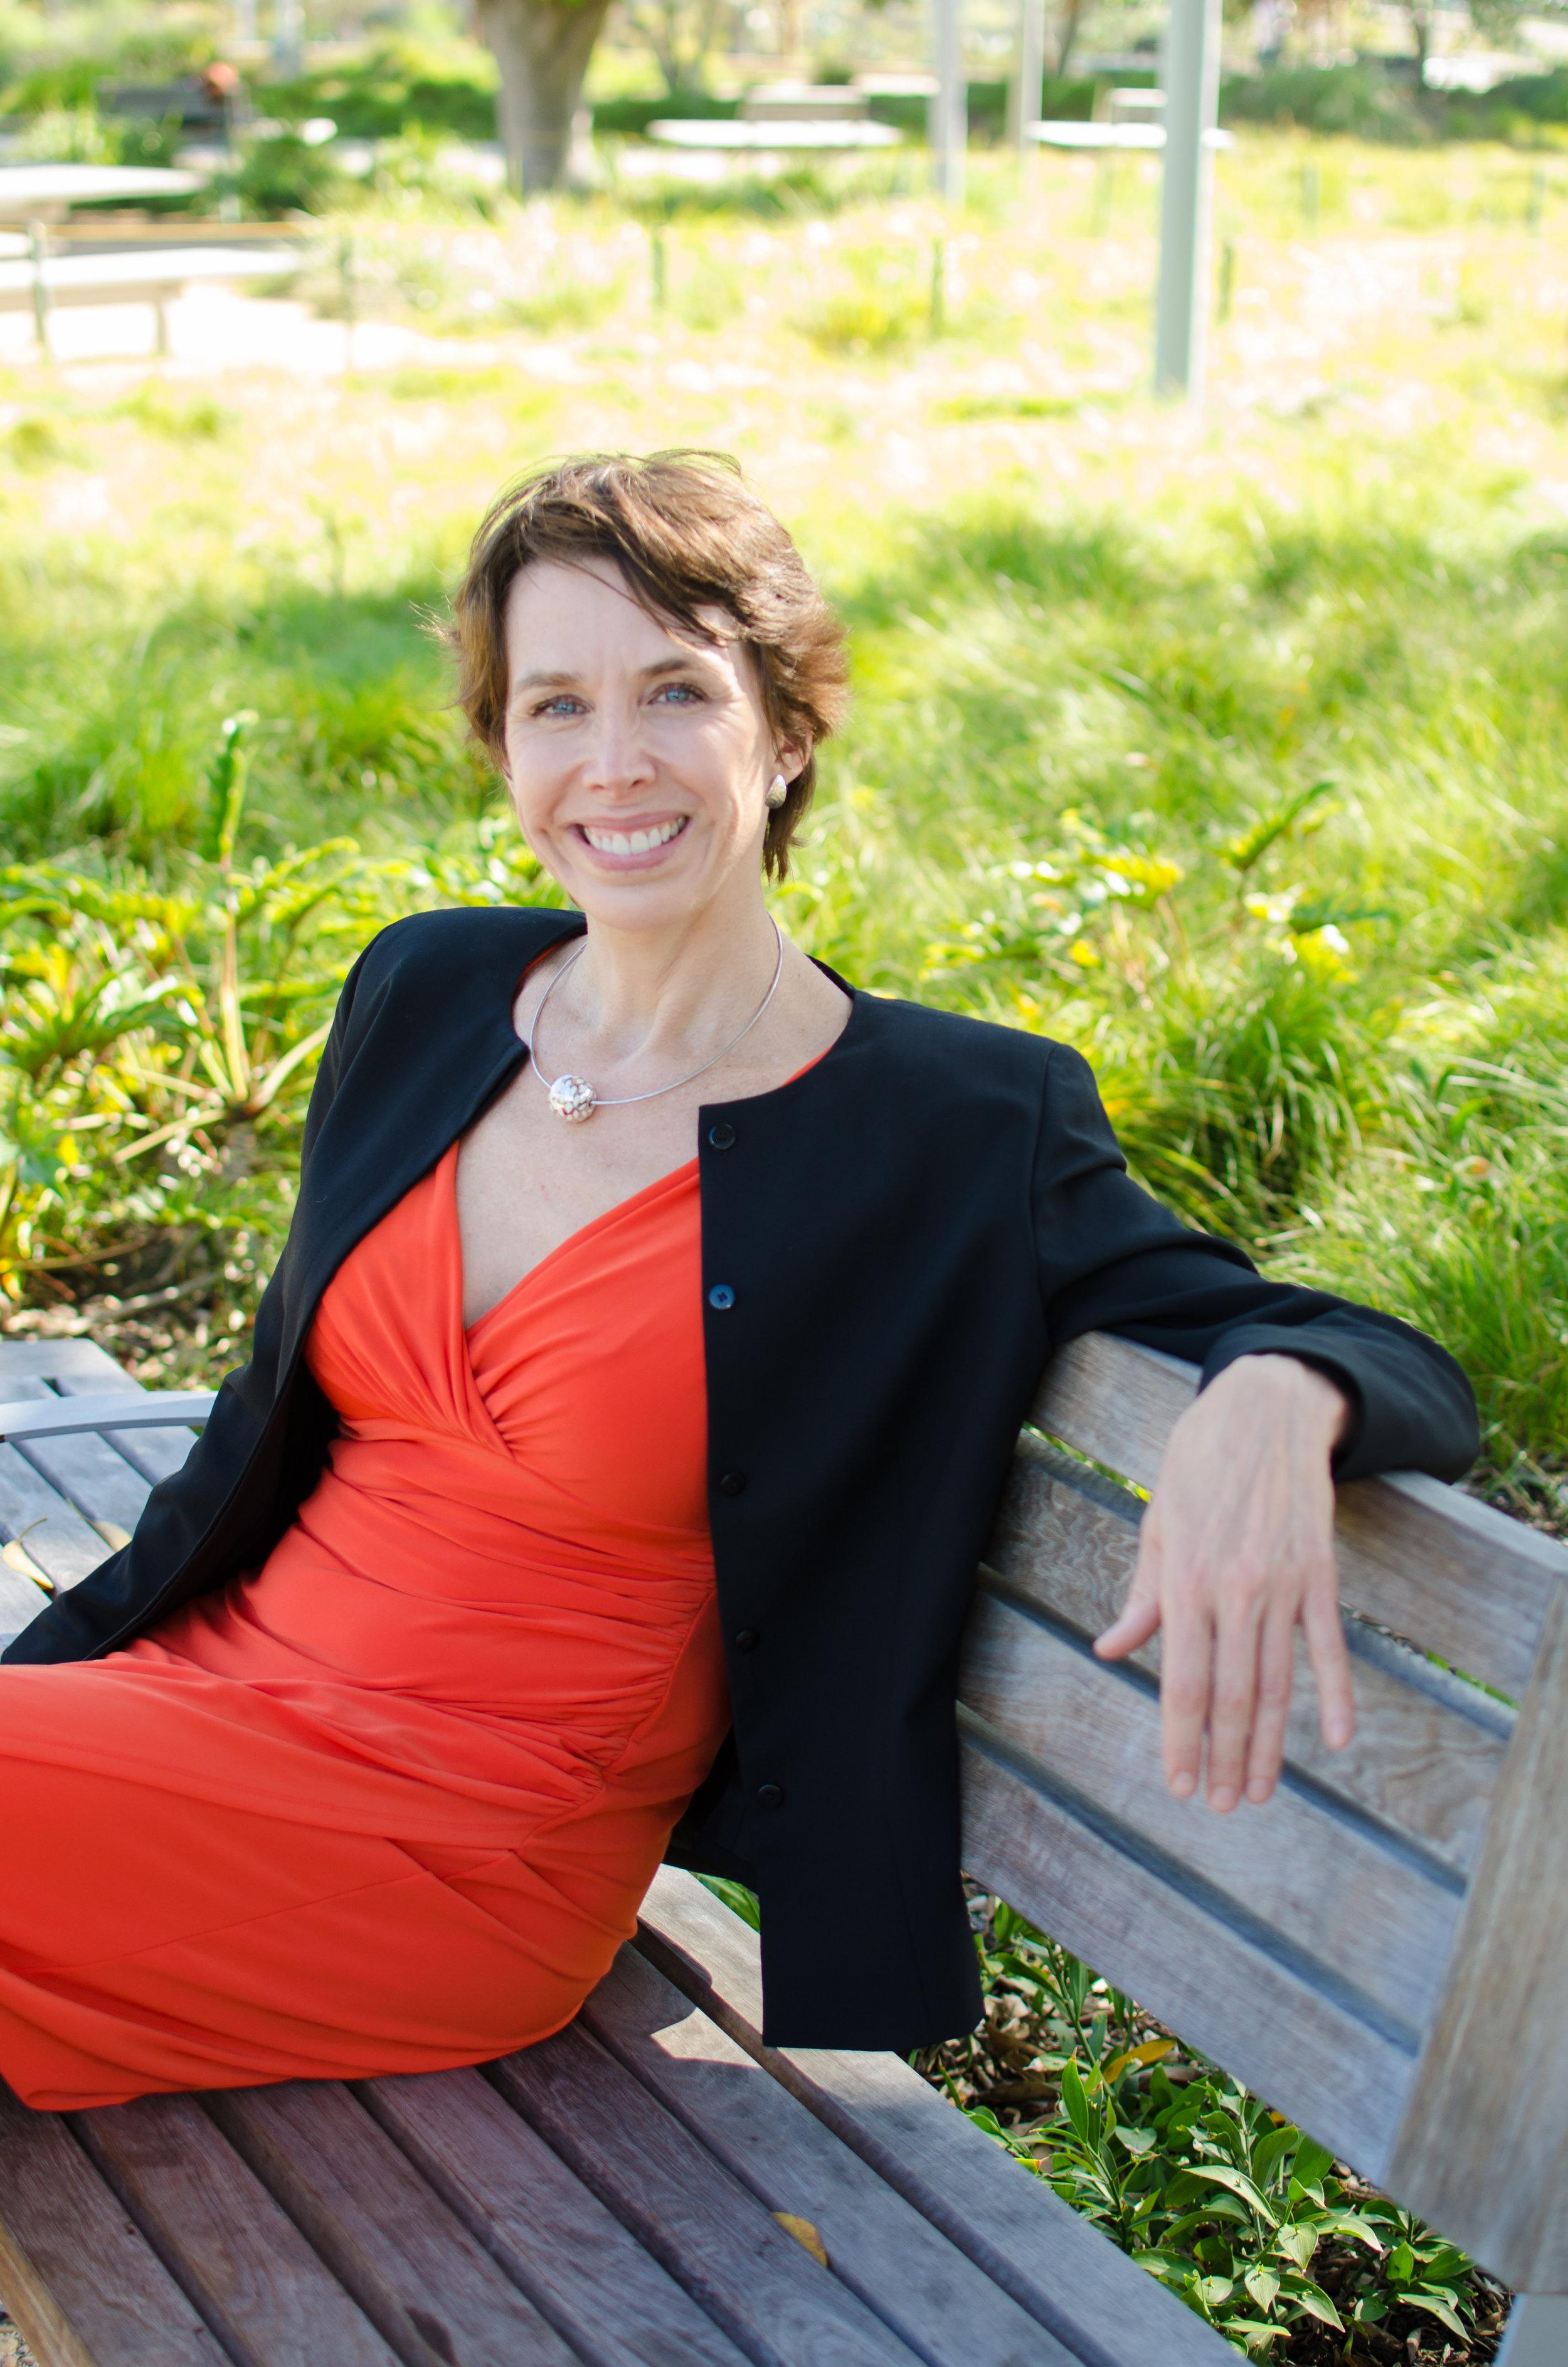 Kim Furzer - Global Operations Executive, Yahoo! Inc.